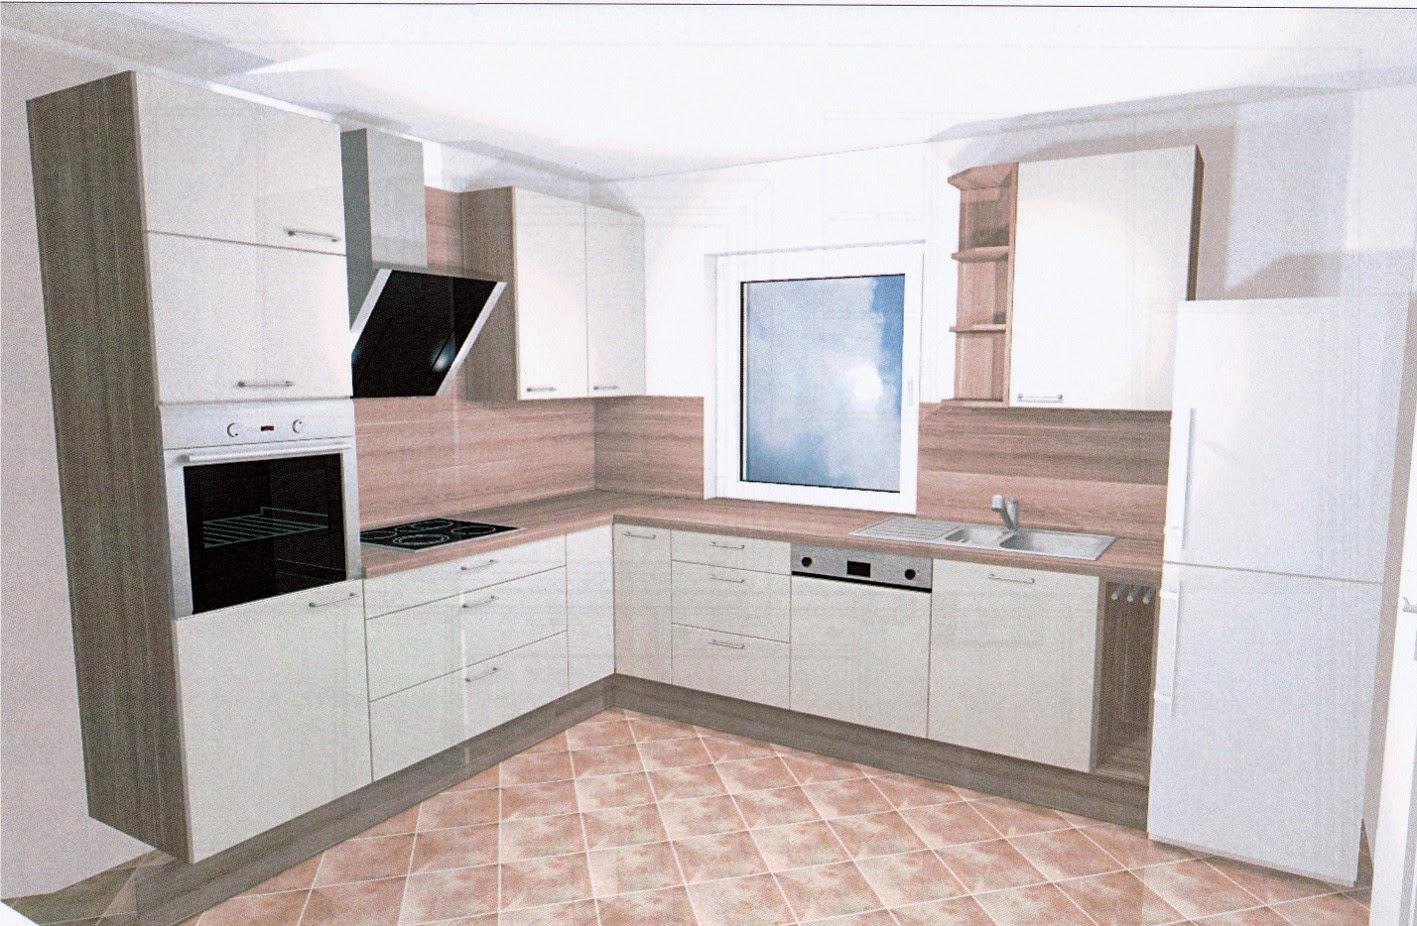 k che aktuell. Black Bedroom Furniture Sets. Home Design Ideas